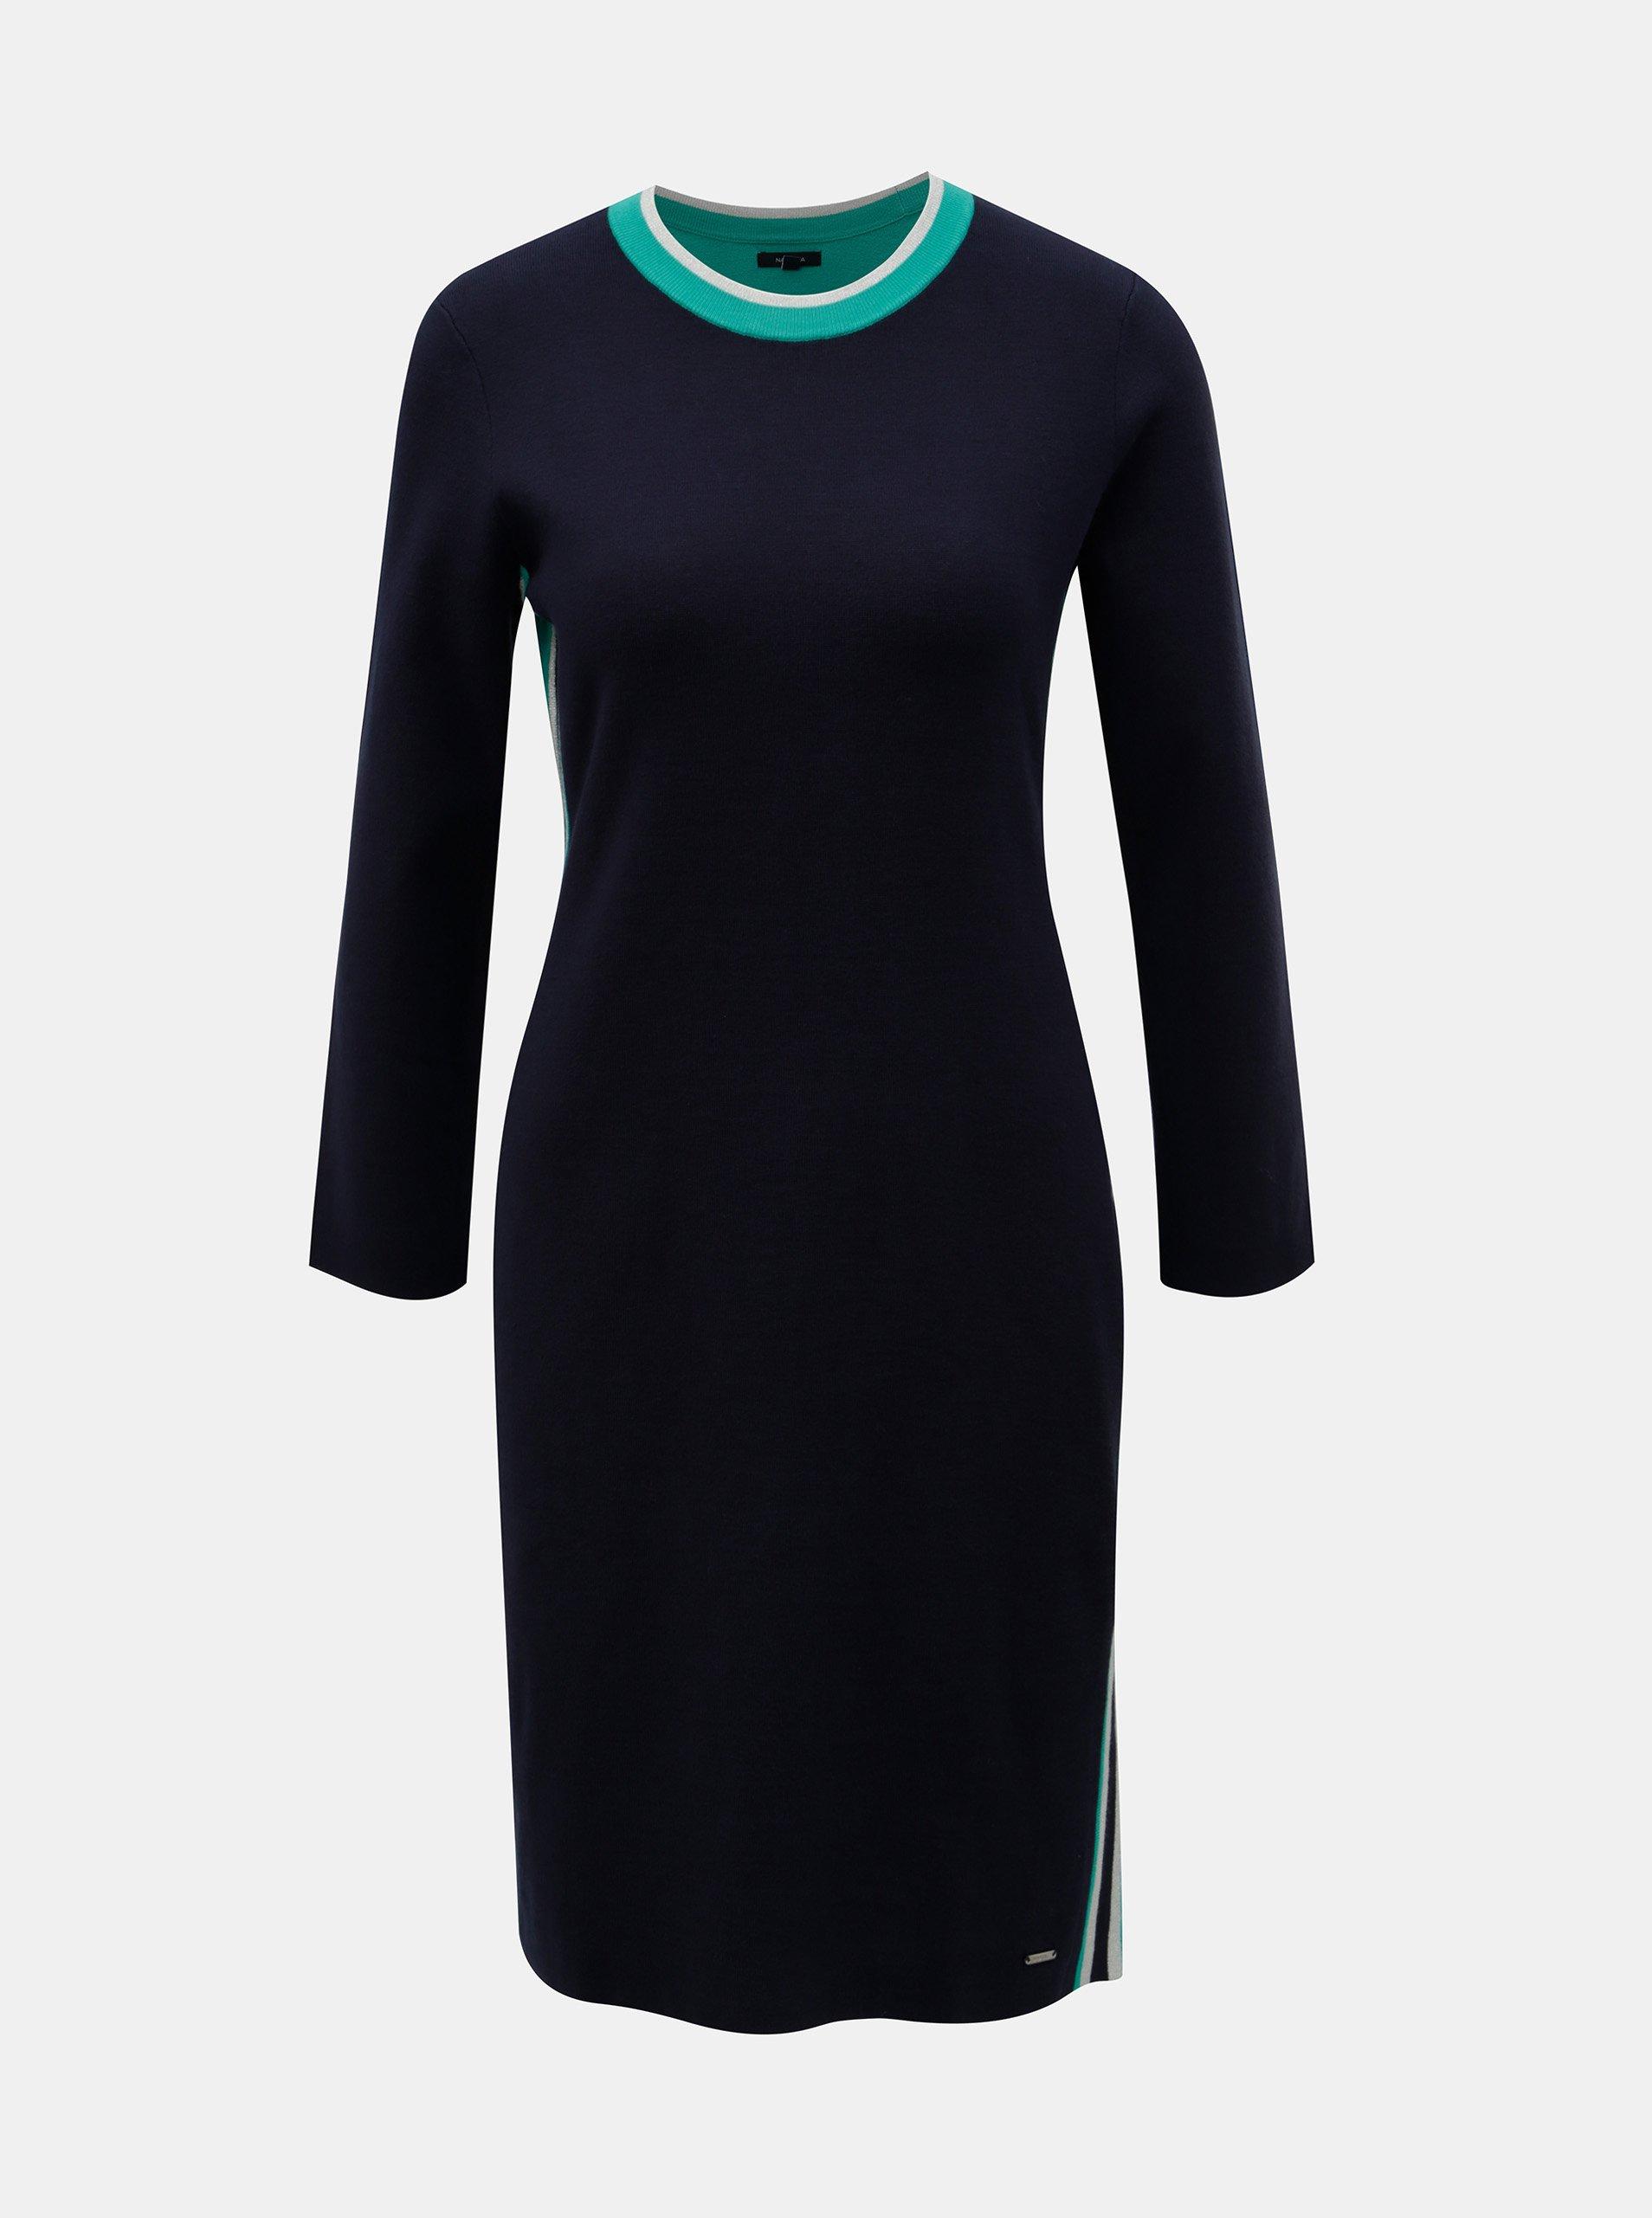 52c40b8f2f69 Tmavě modré svetrové šaty s pruhy na bocích Nautica - Glami.cz